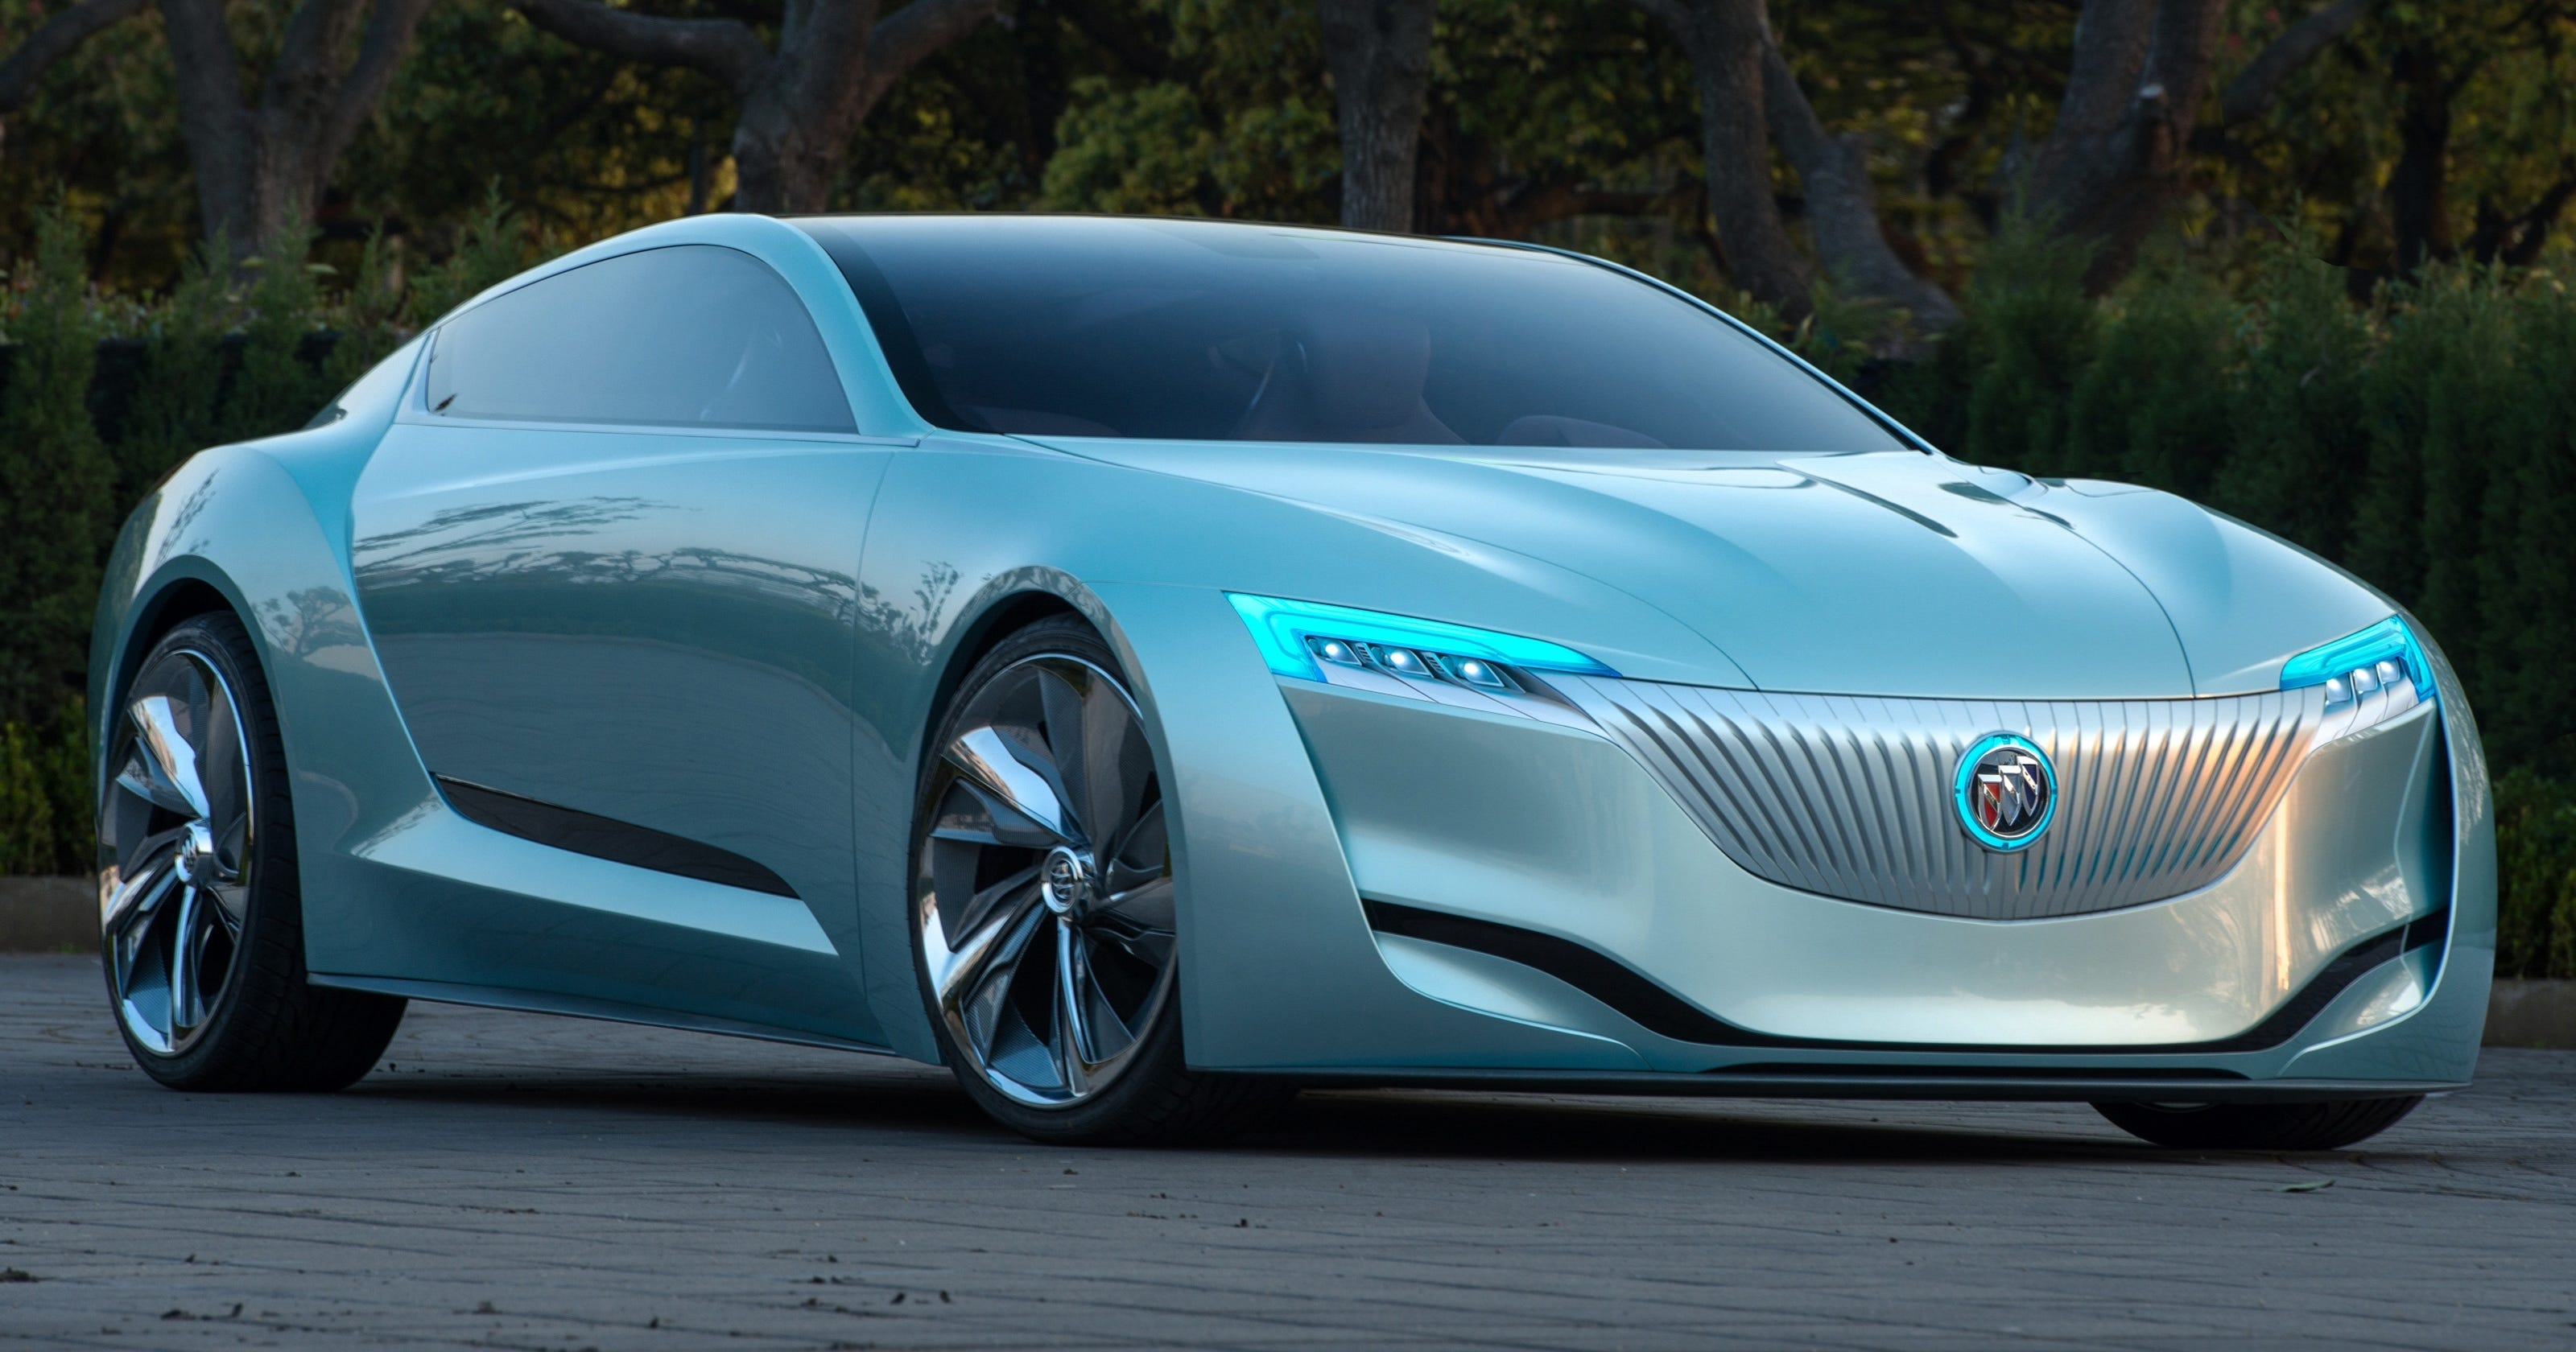 Buick unveils China-designed Riviera concept in Shanghai